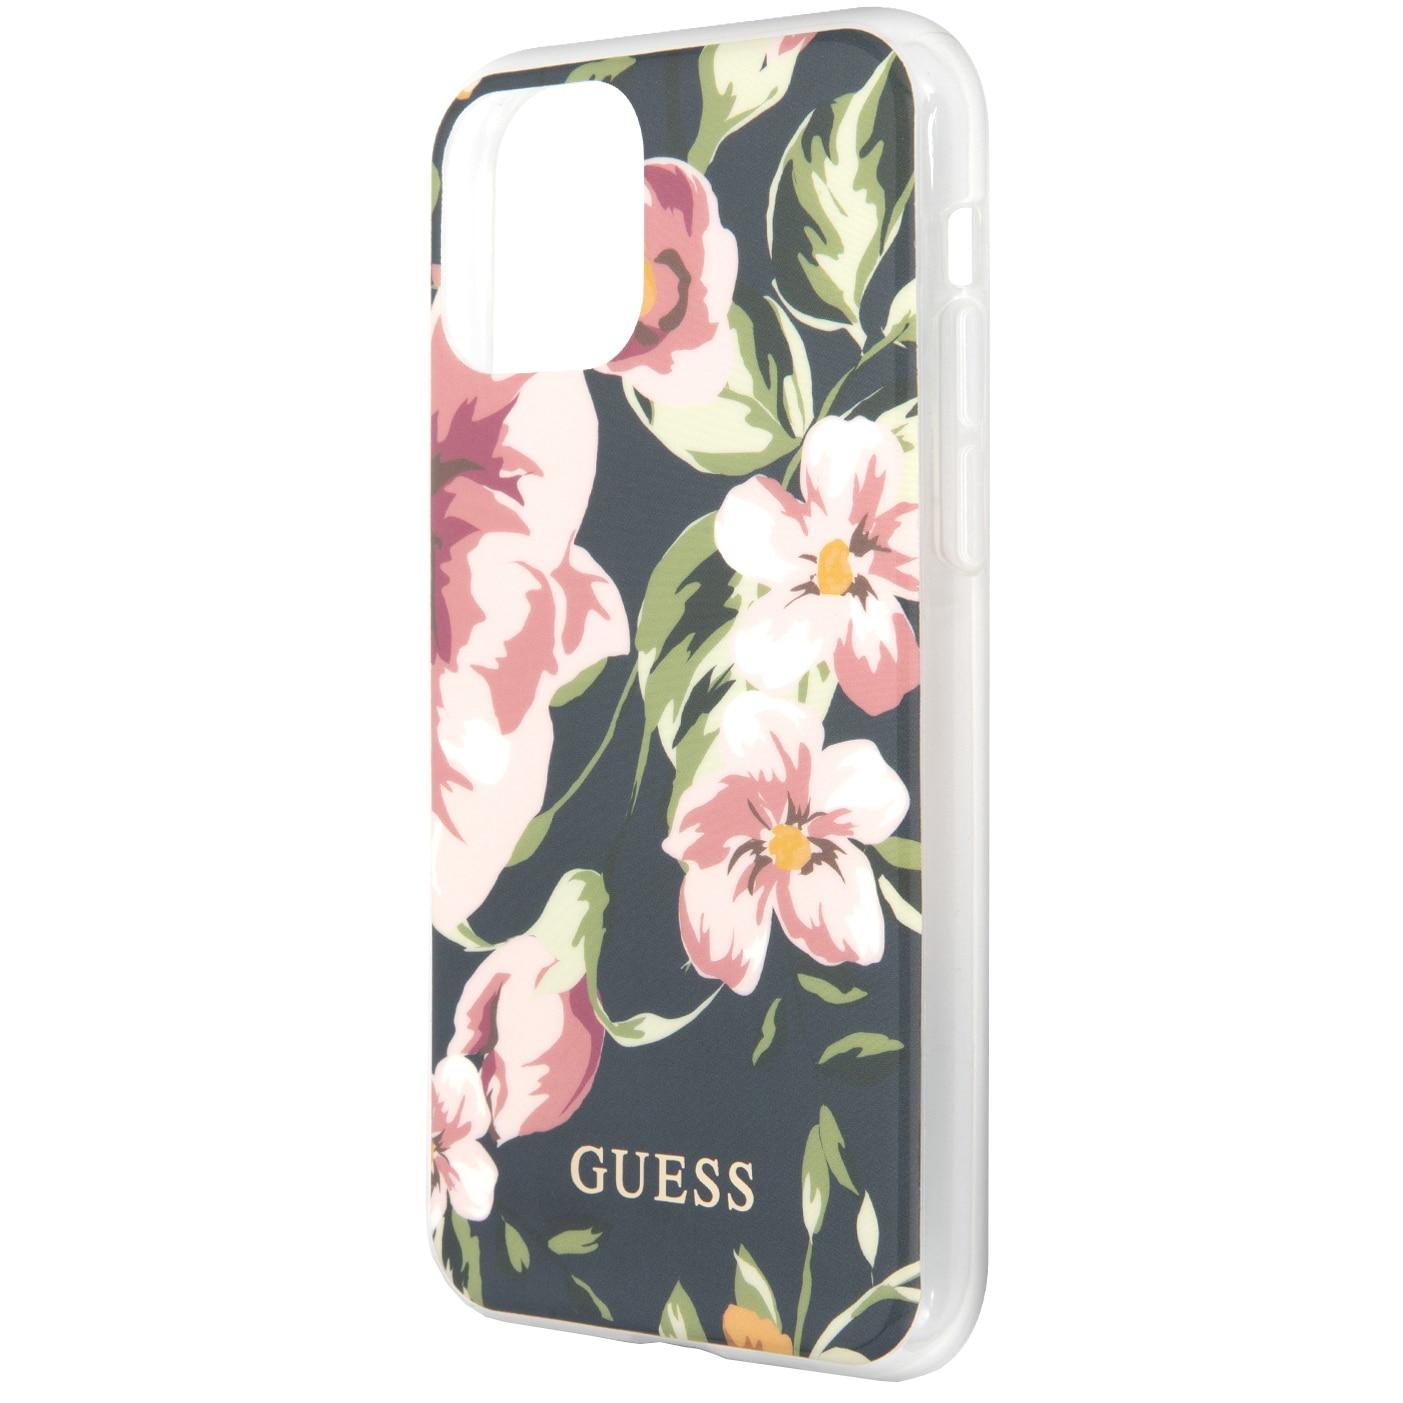 Fotografie Husa de protectie Guess N*3 Flower pentru iPhone 11 Pro Max, GUHCN65IMLFL03, Blue